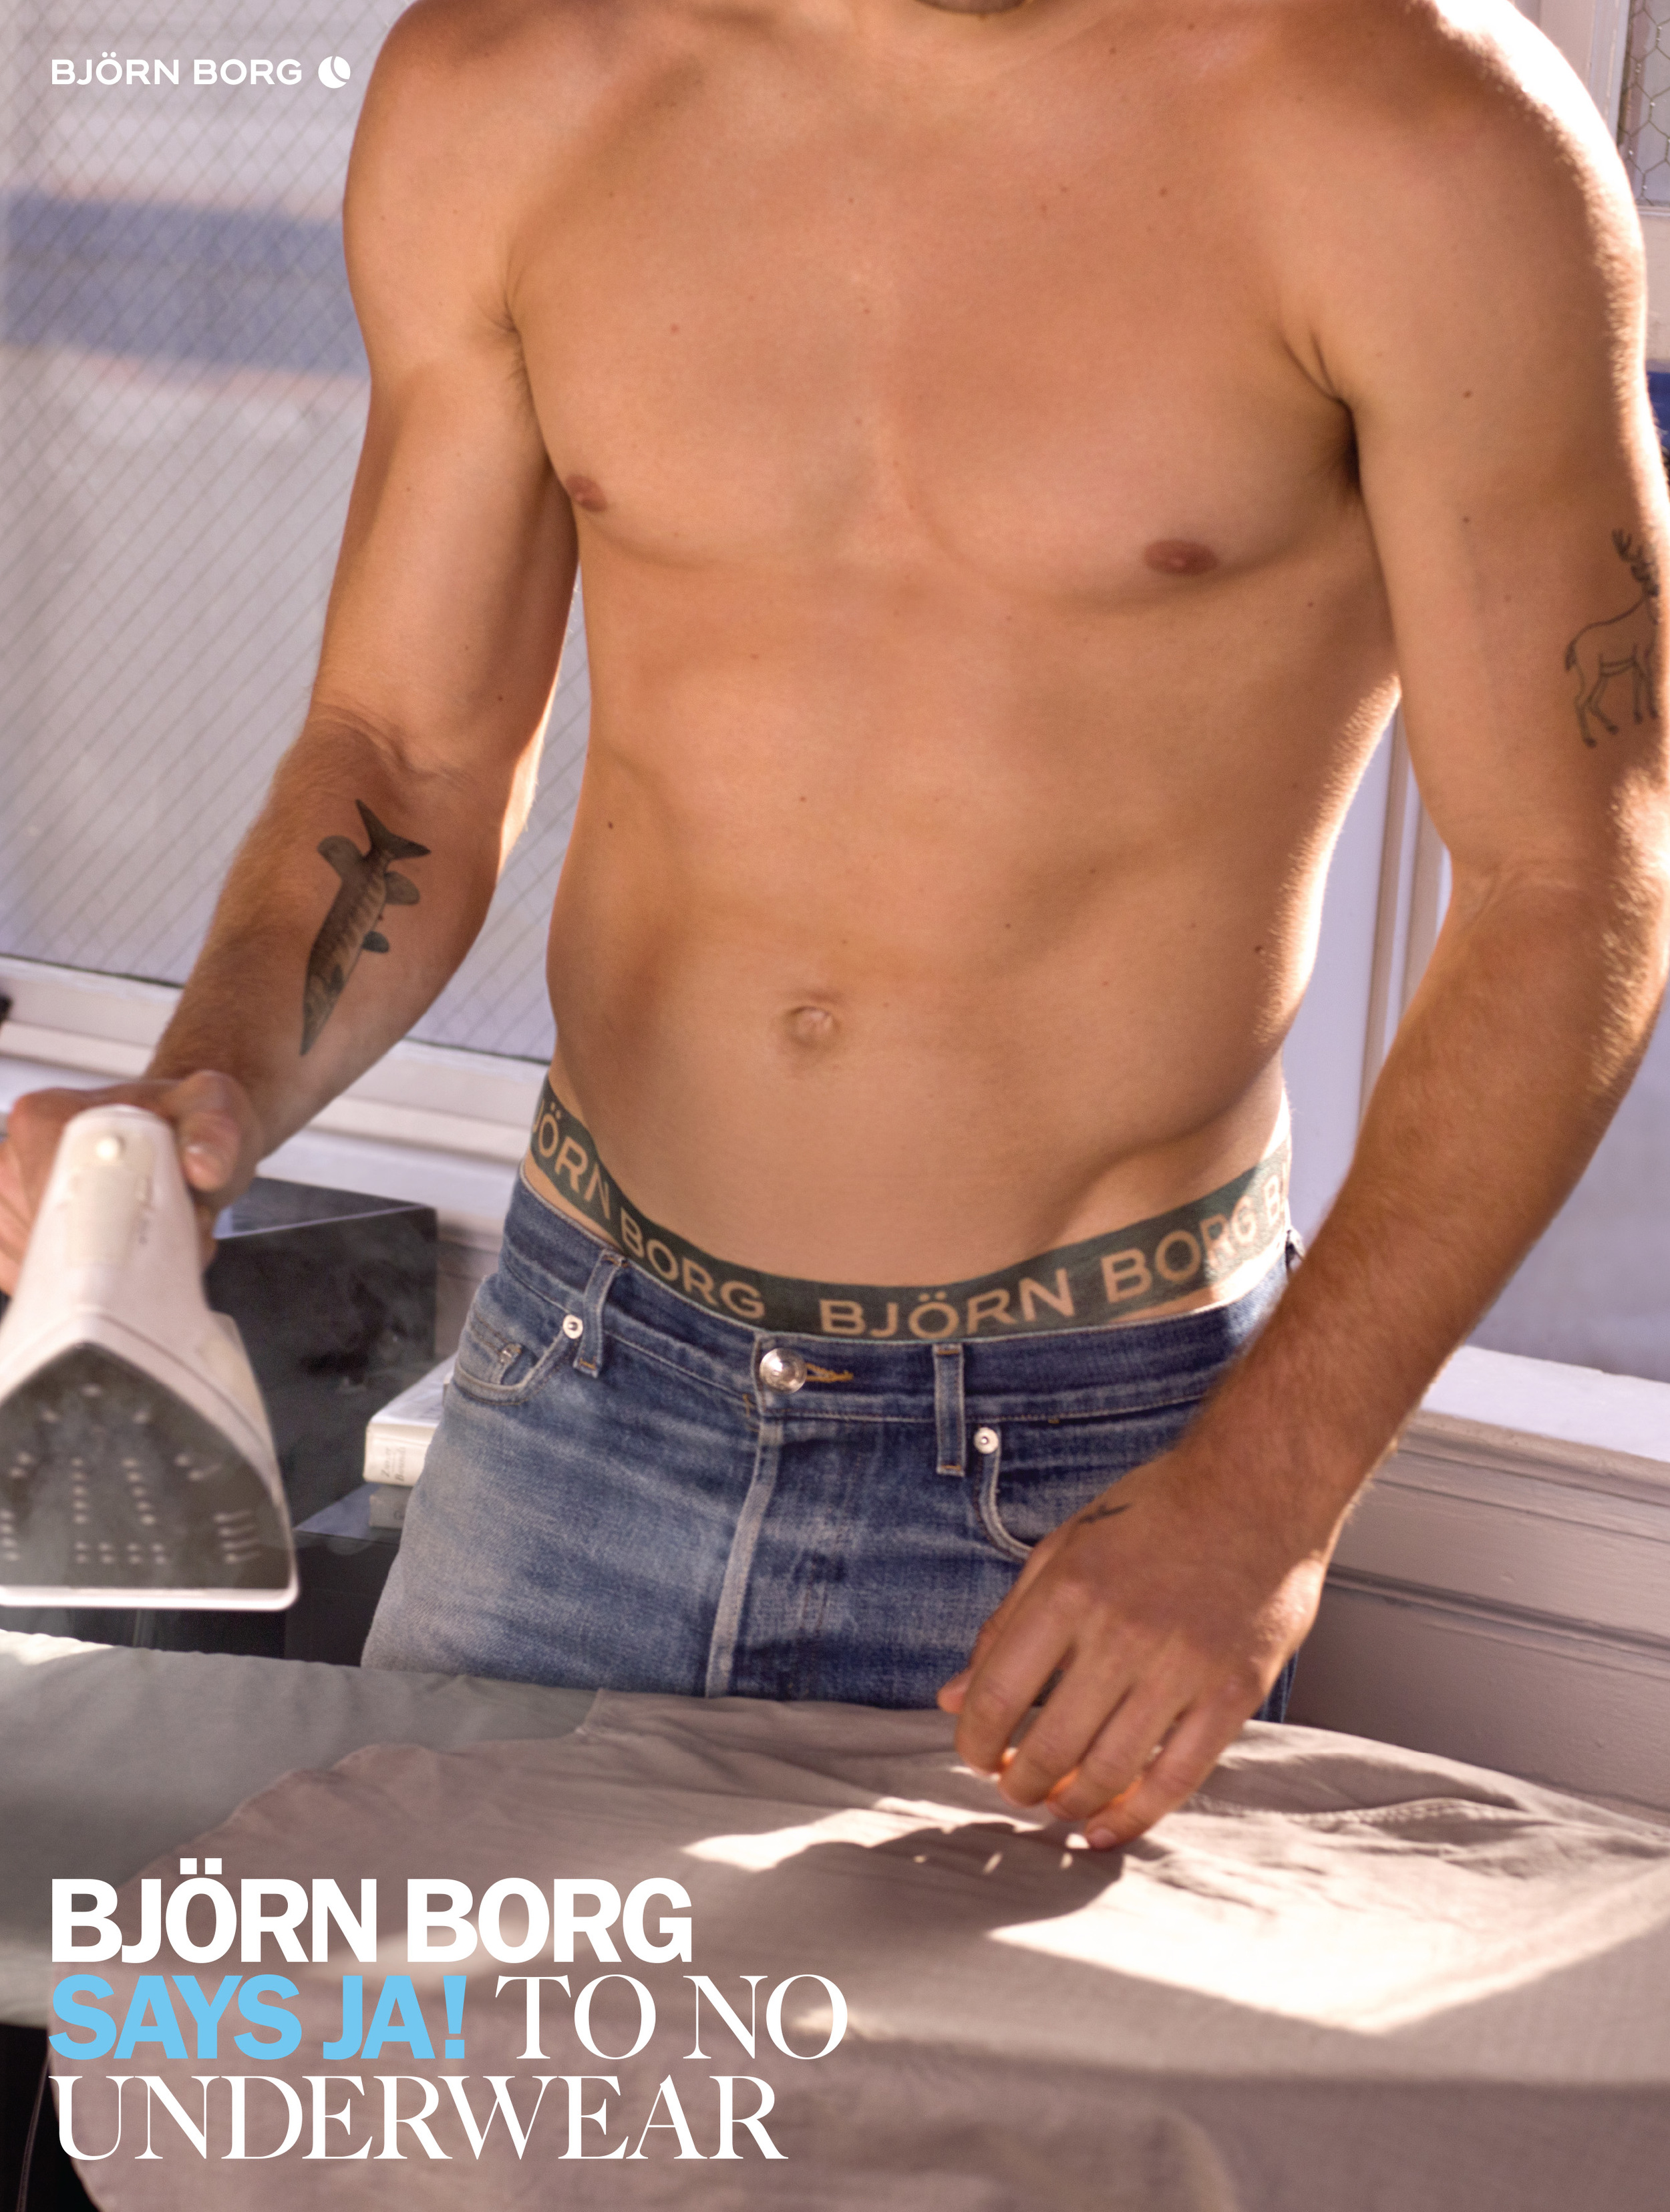 Bjorn Borg Underwear :: Says Ja!